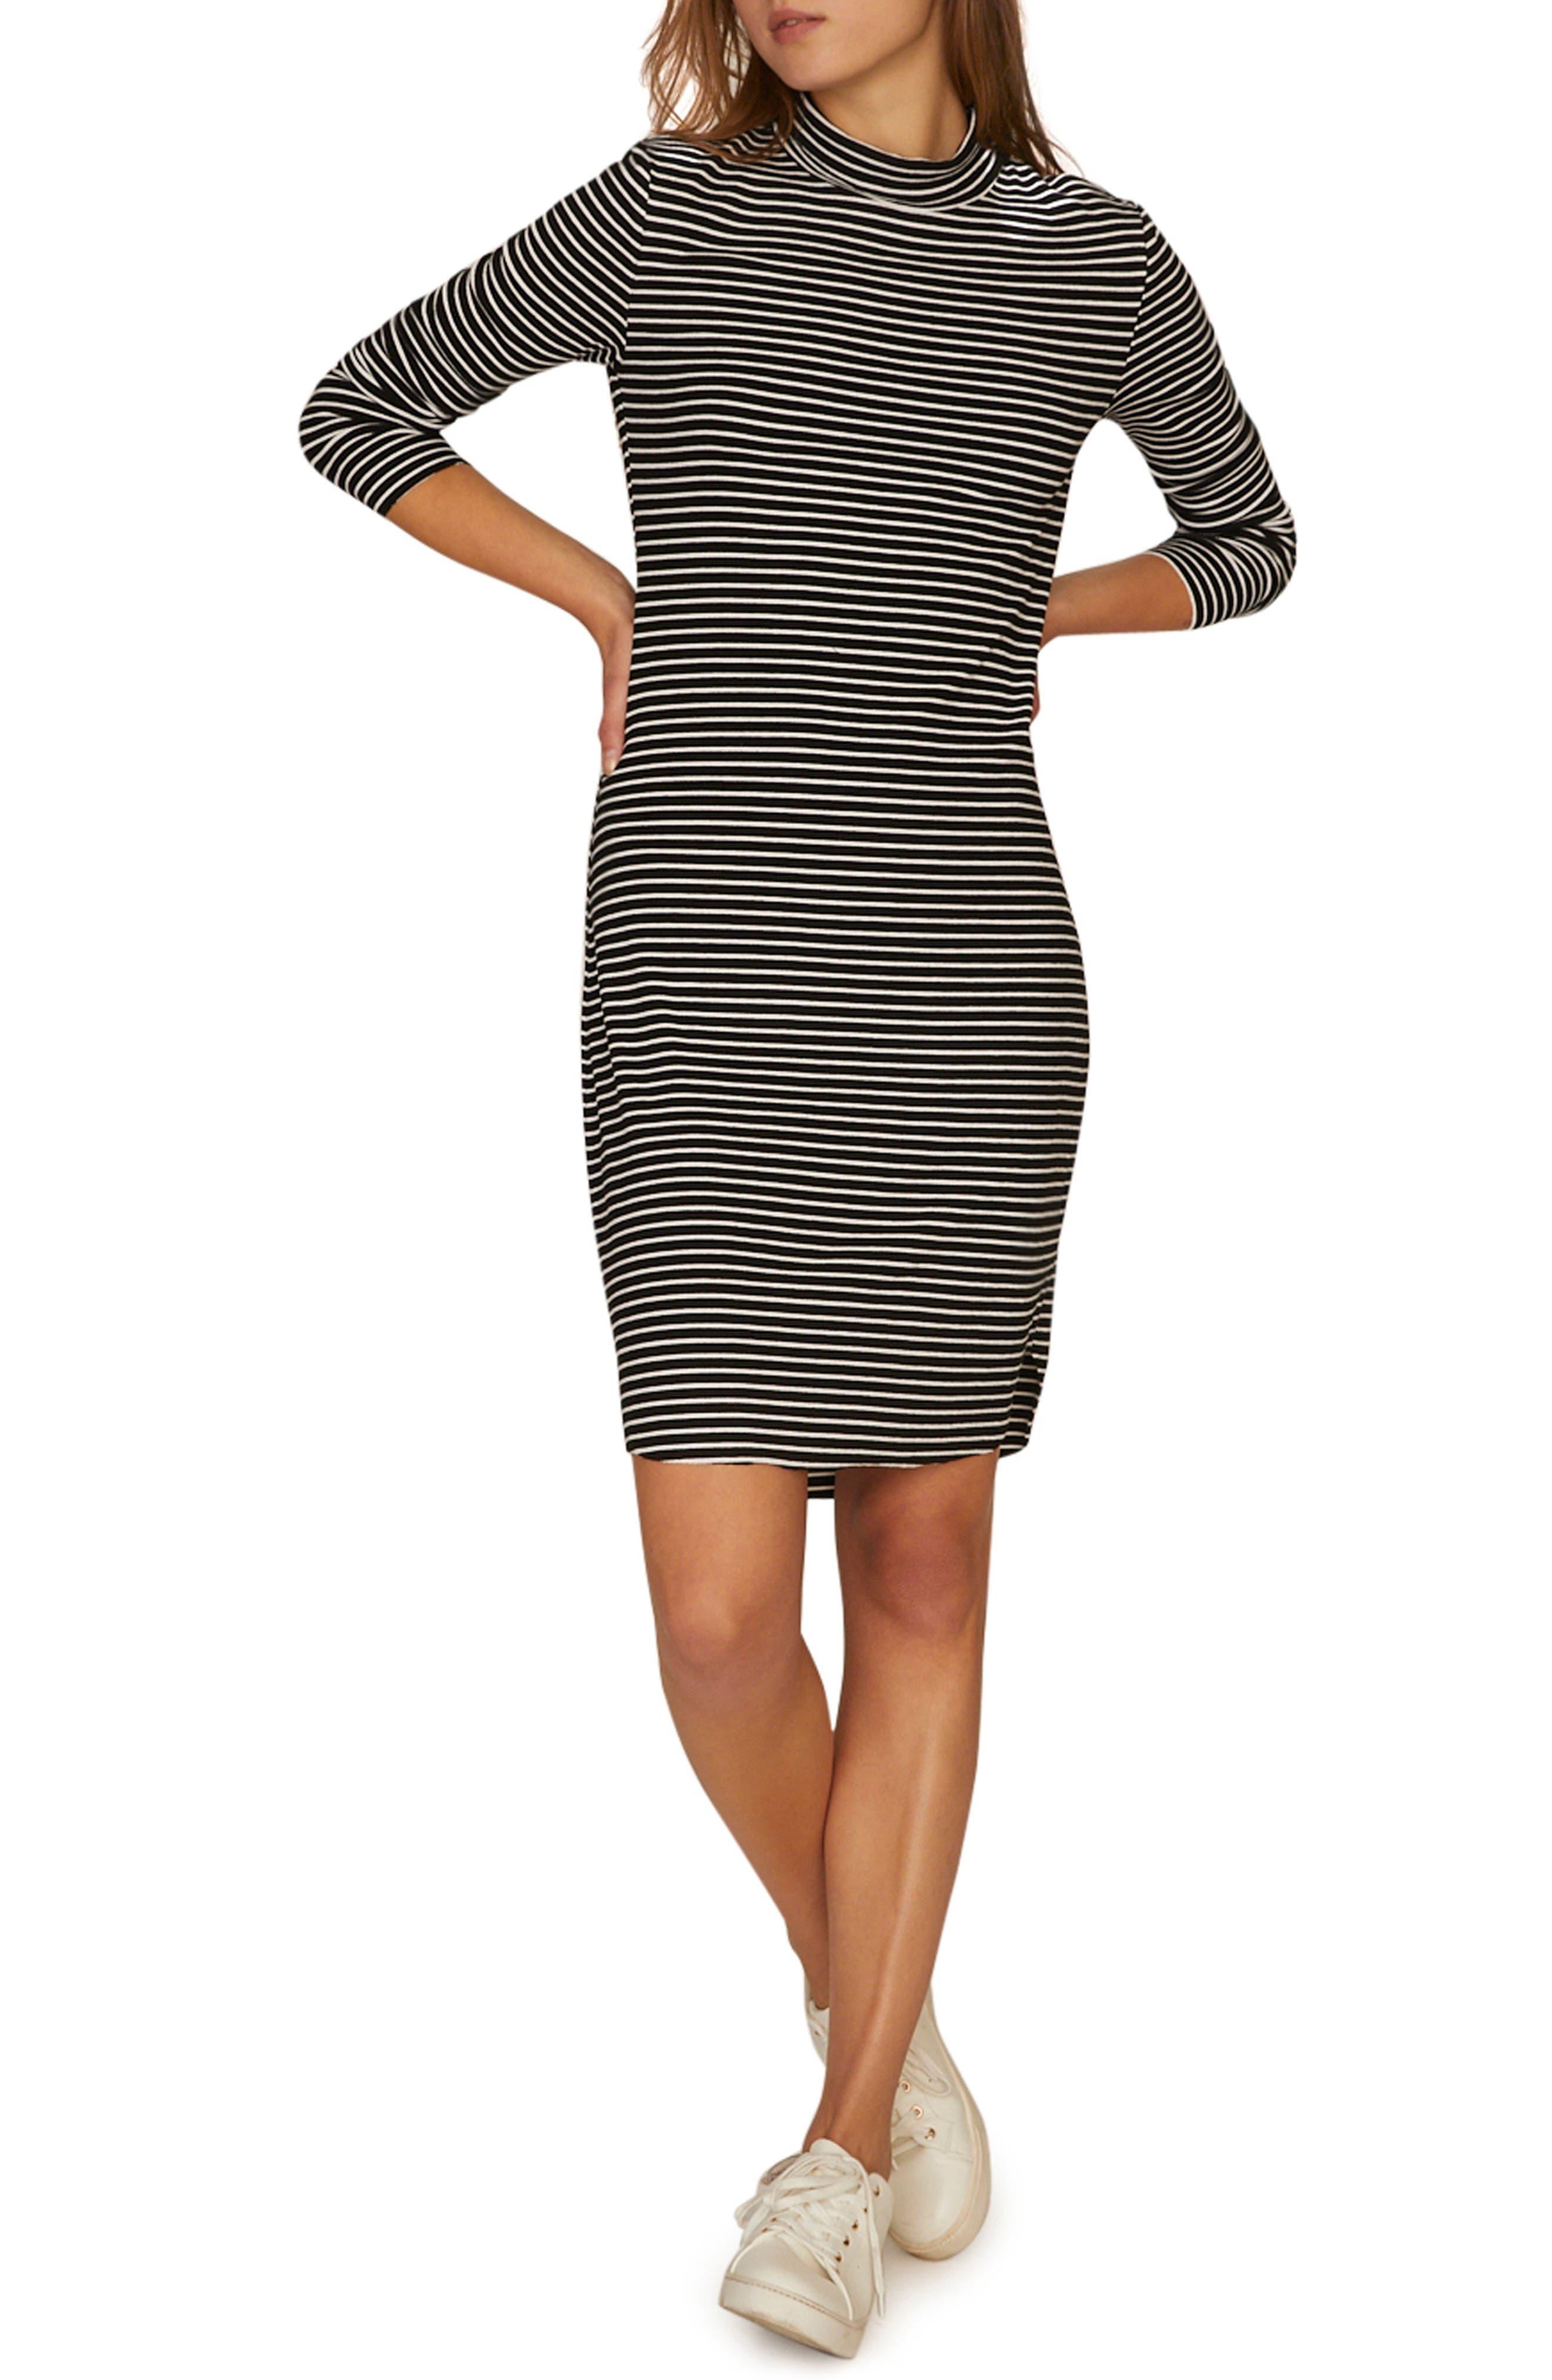 Petite Sanctuary Essentials Stripe Mock Neck Dress, Black